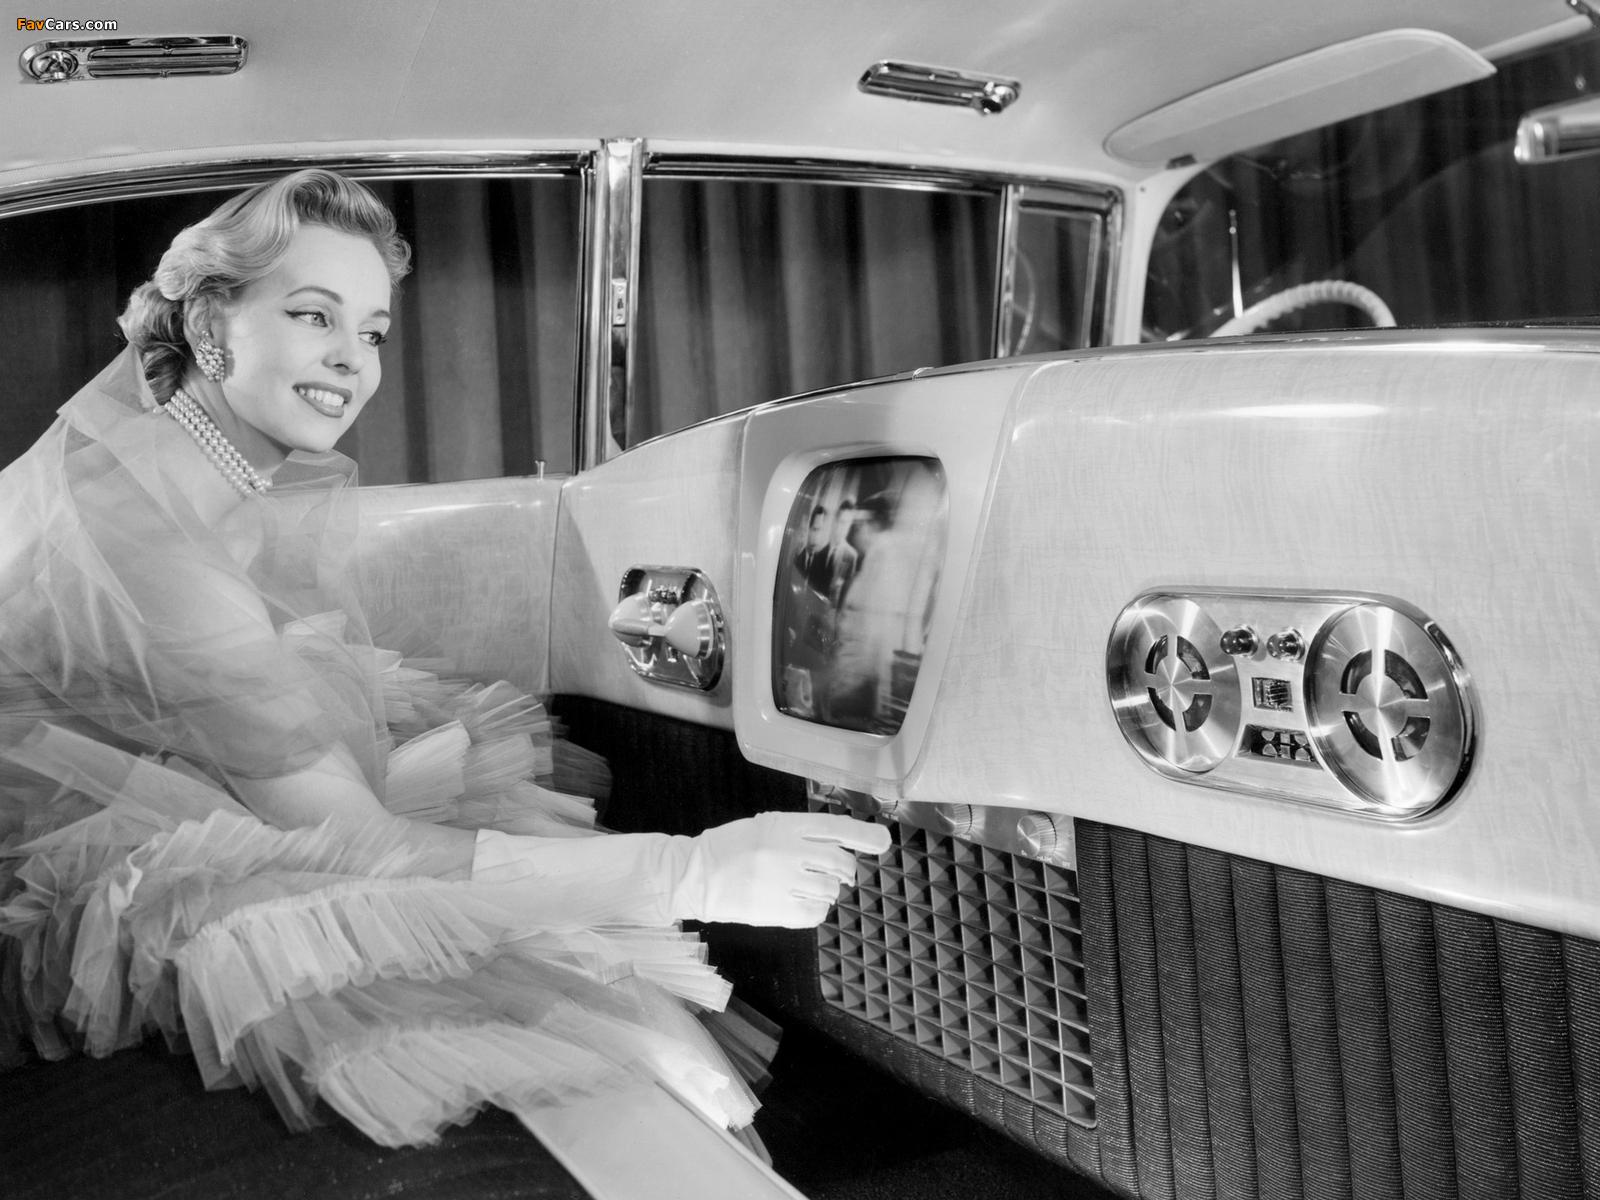 Cadillac Eldorado Brougham Dream Car 1955 wallpapers (1600 x 1200)